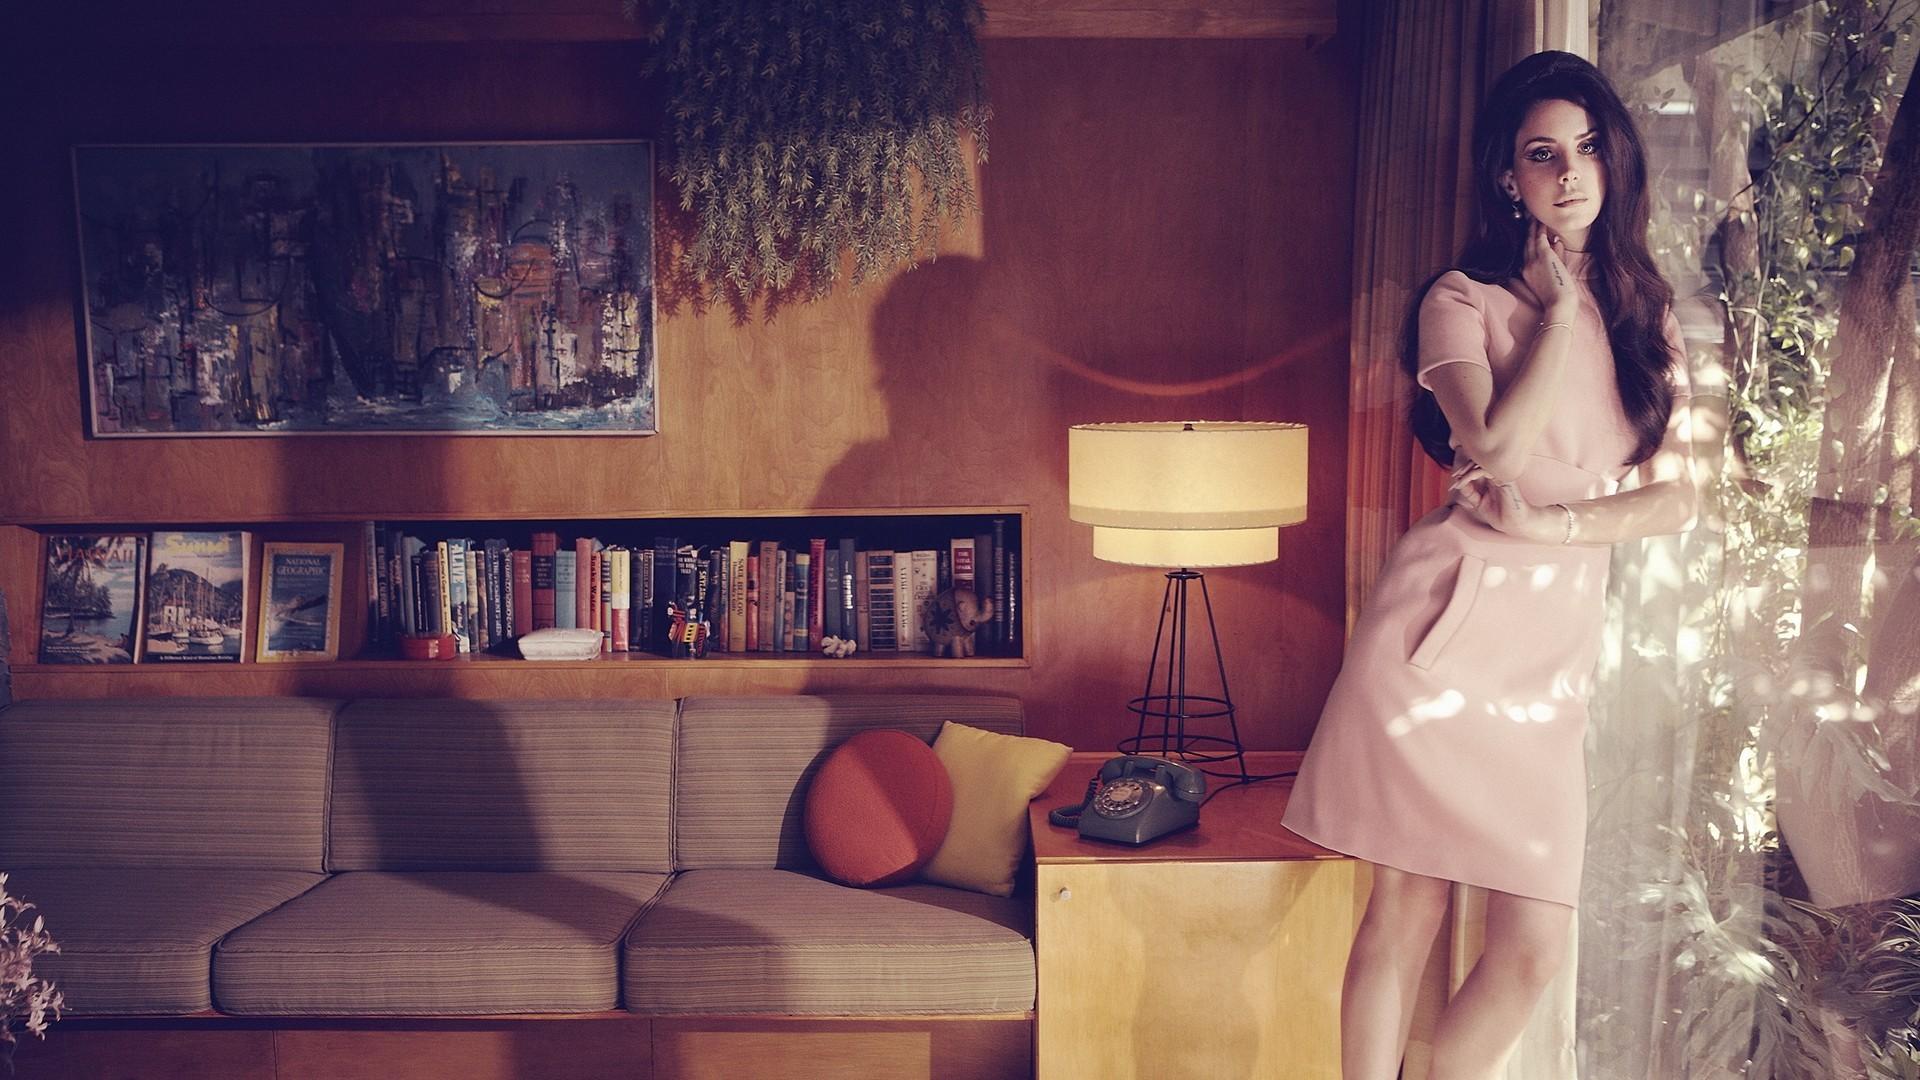 23 HD Lana Del Rey Wallpapers - HDWallSource.com Lana Del Rey Background Lyrics